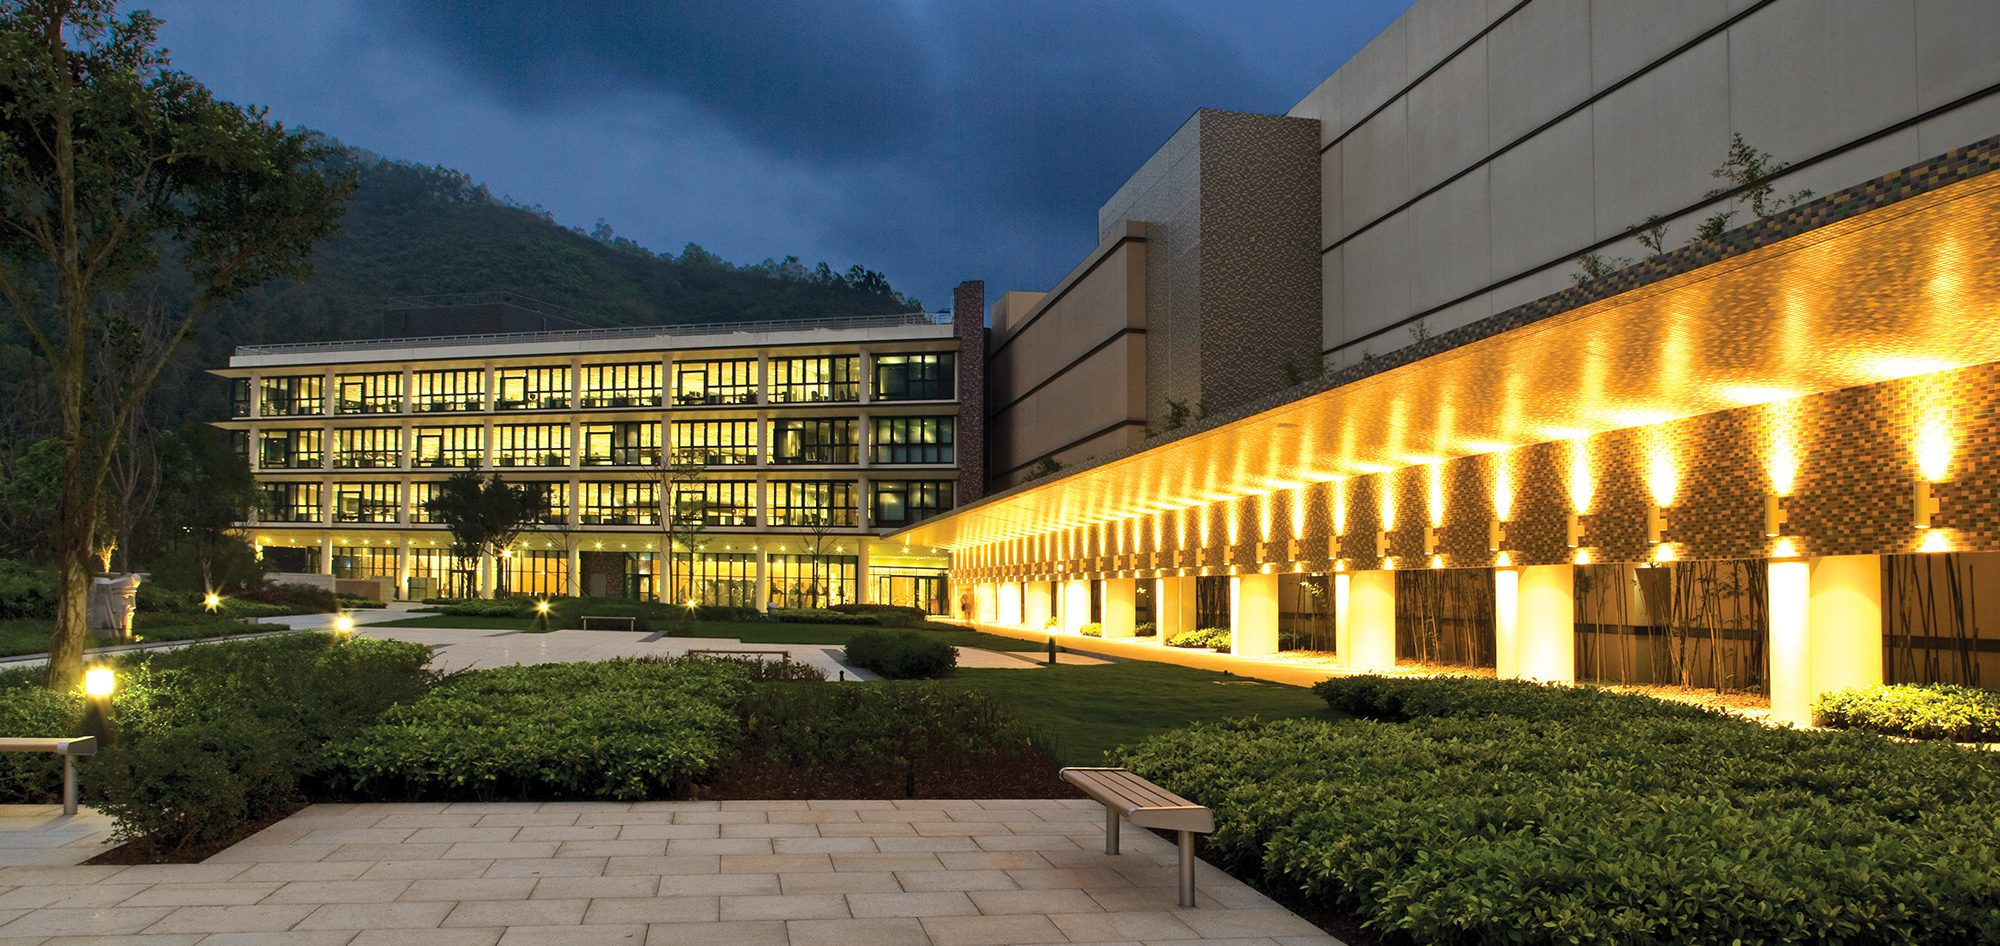 HSBC Building Tseung Kwan O